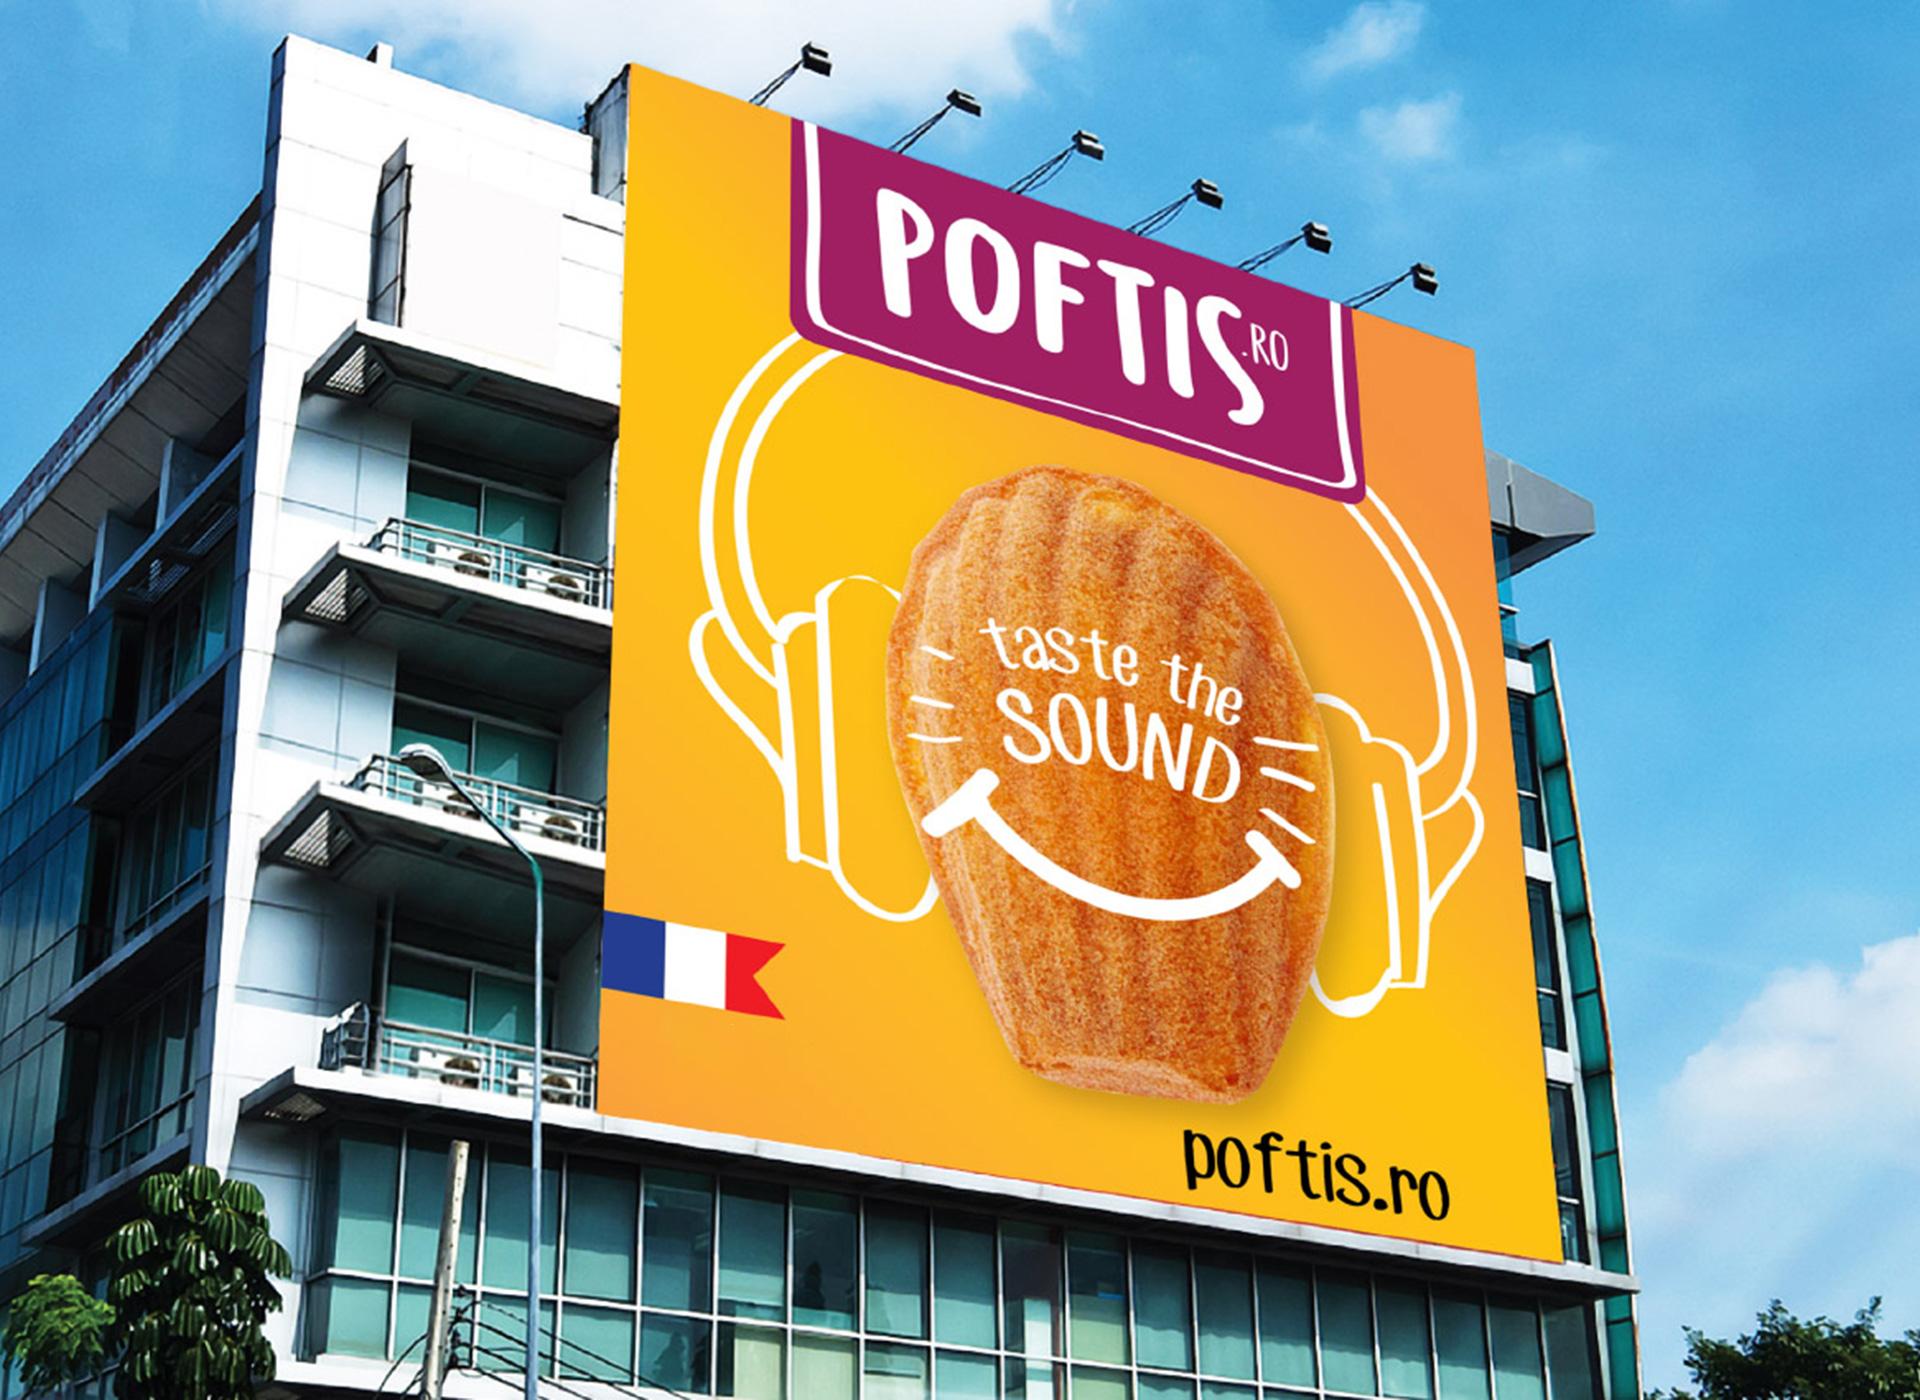 poftis buildng branding inoveo